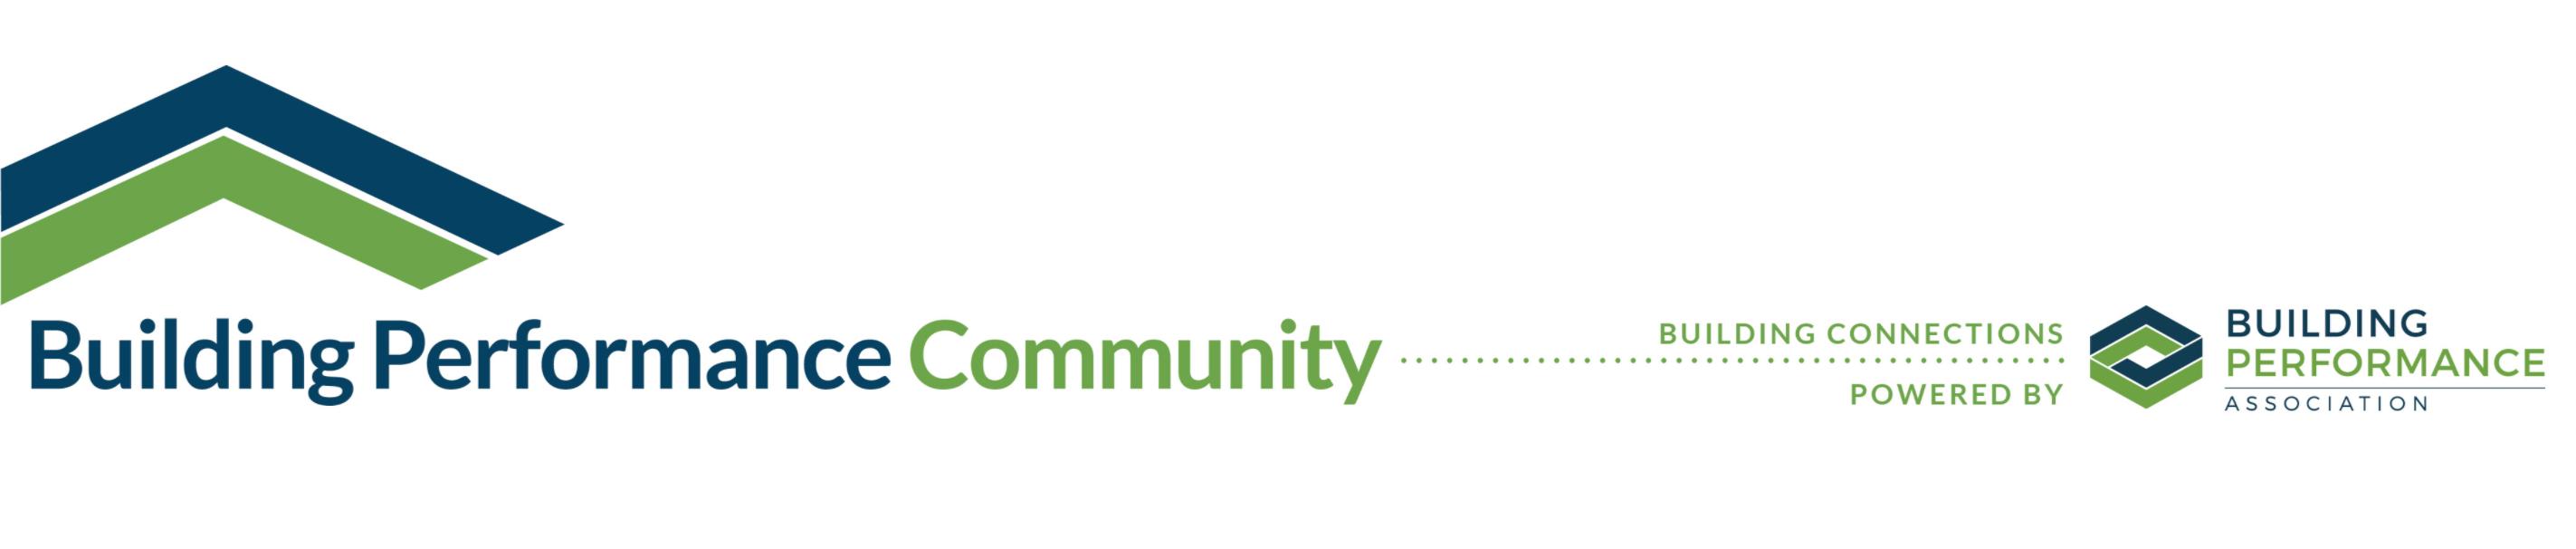 Building Performance Community Logo